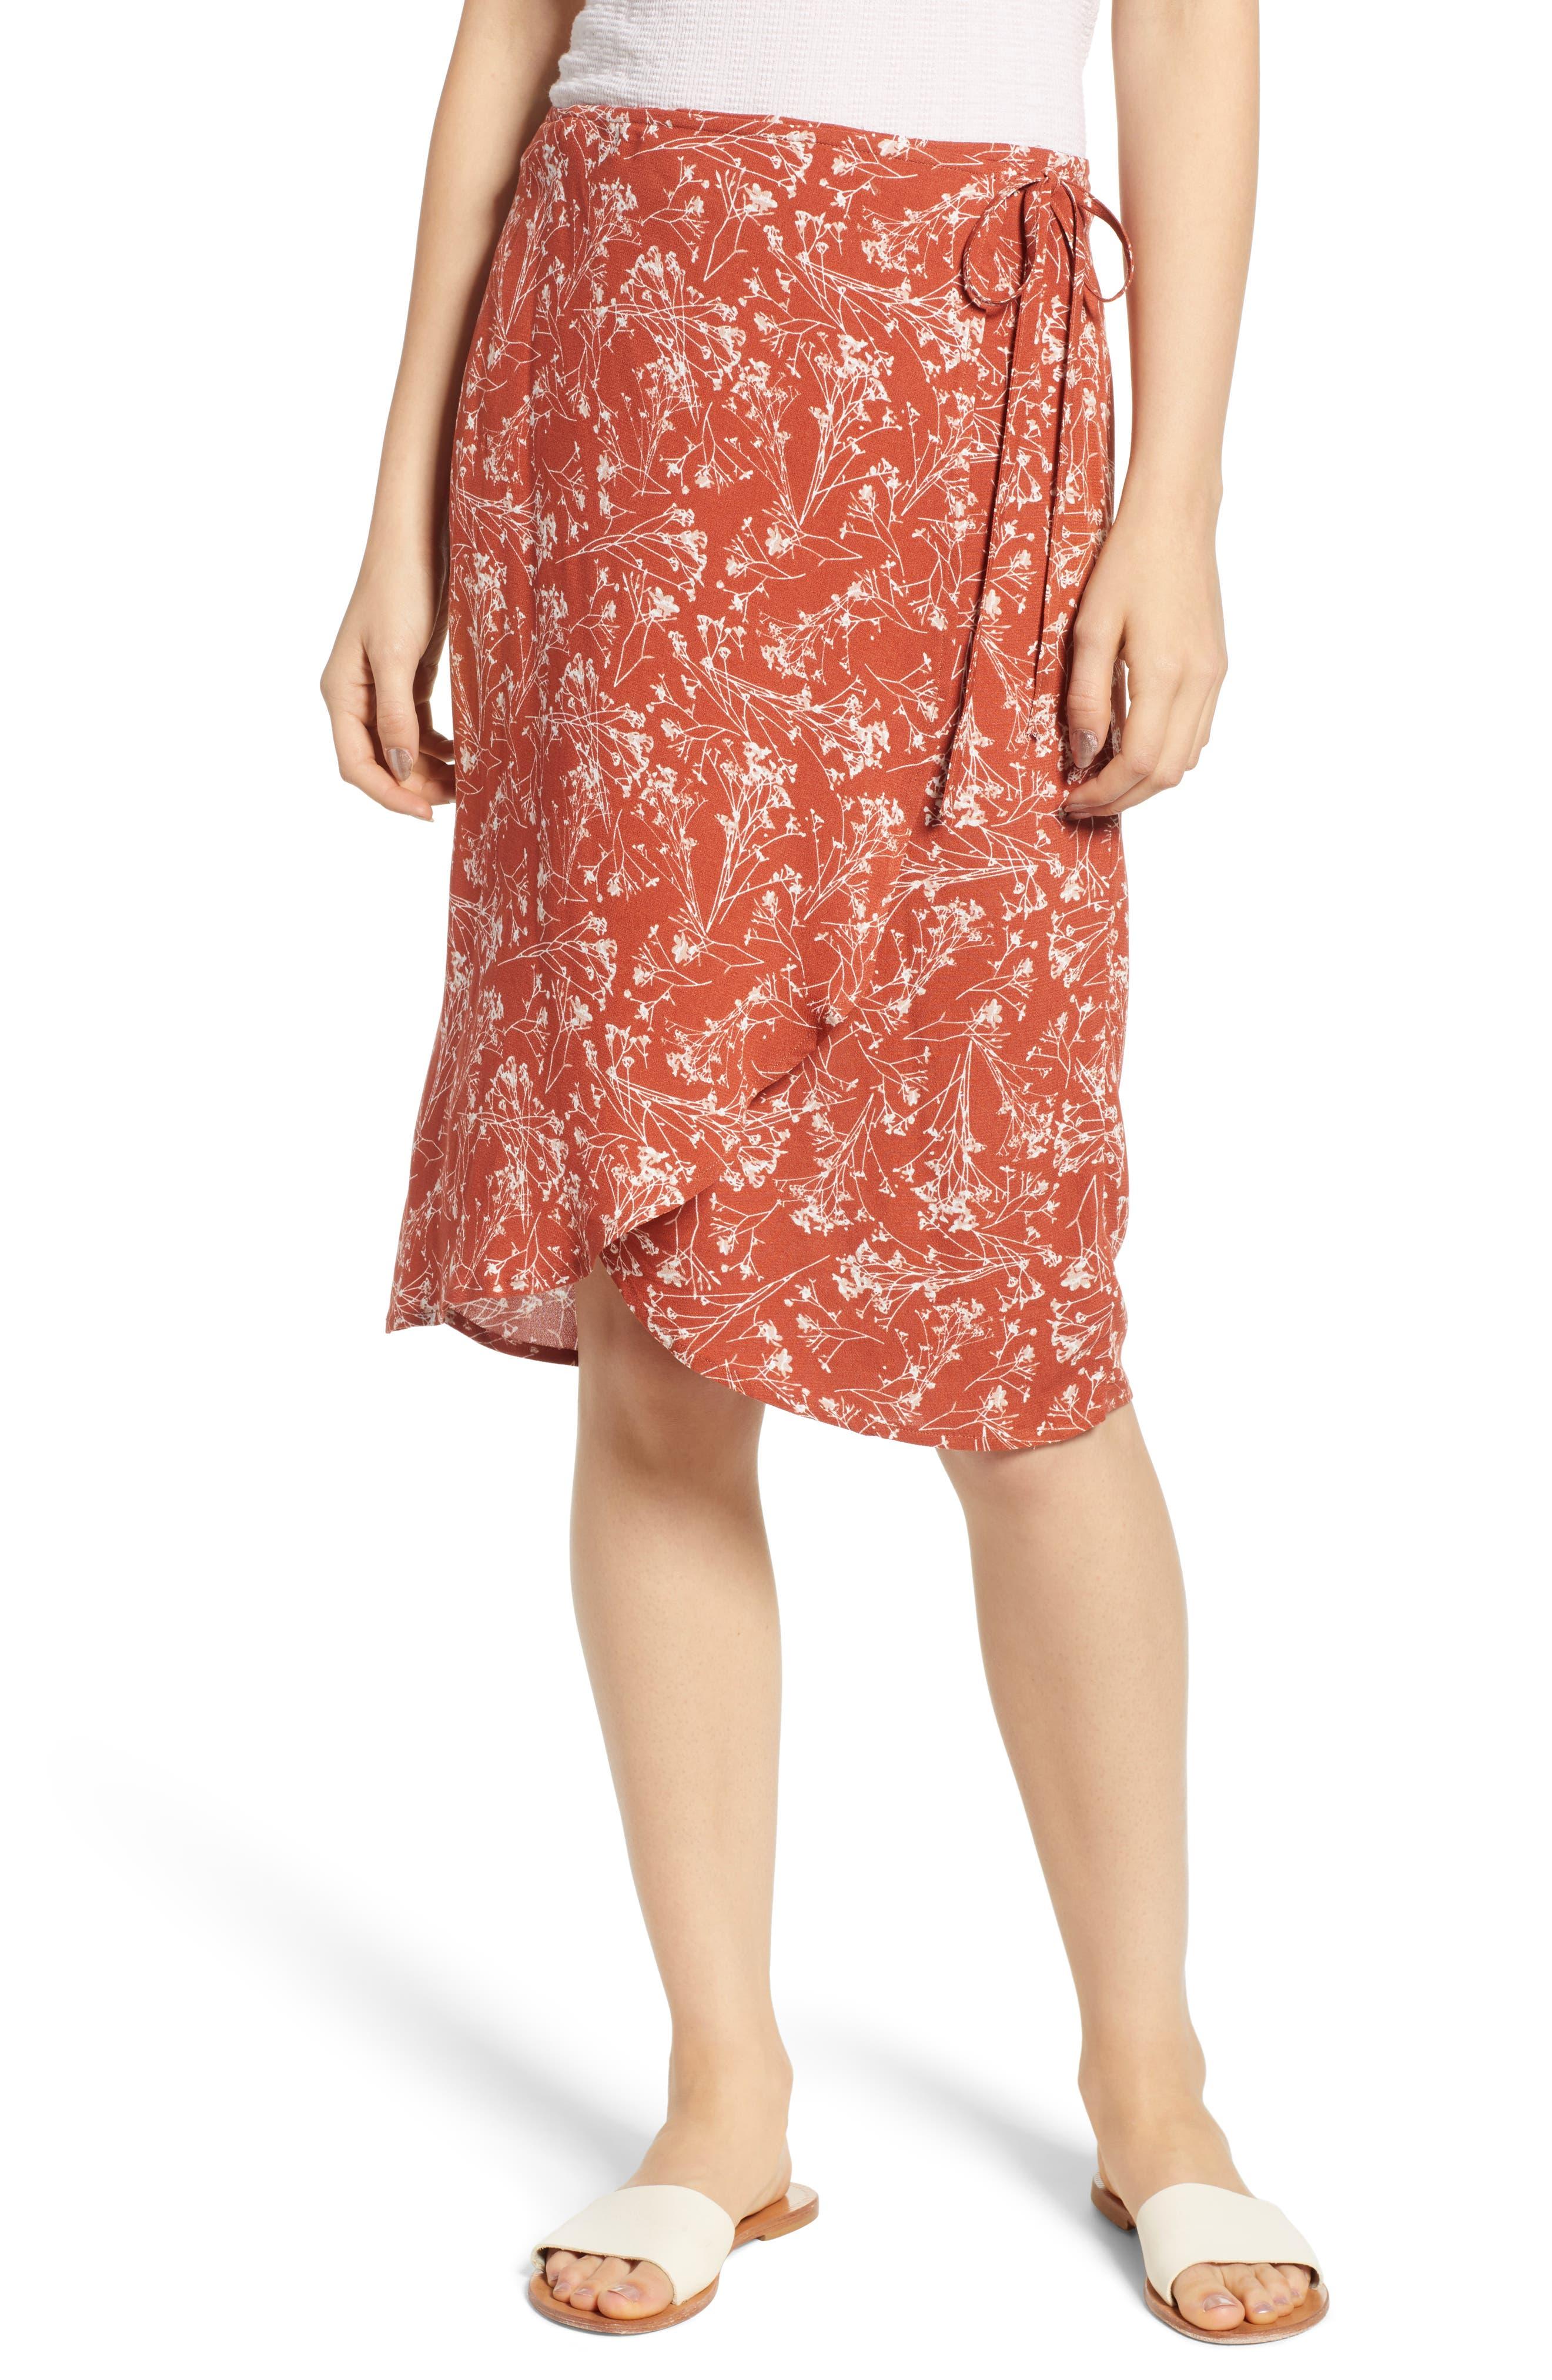 Lira Clothing Wrap Me Up Print Wrap Skirt